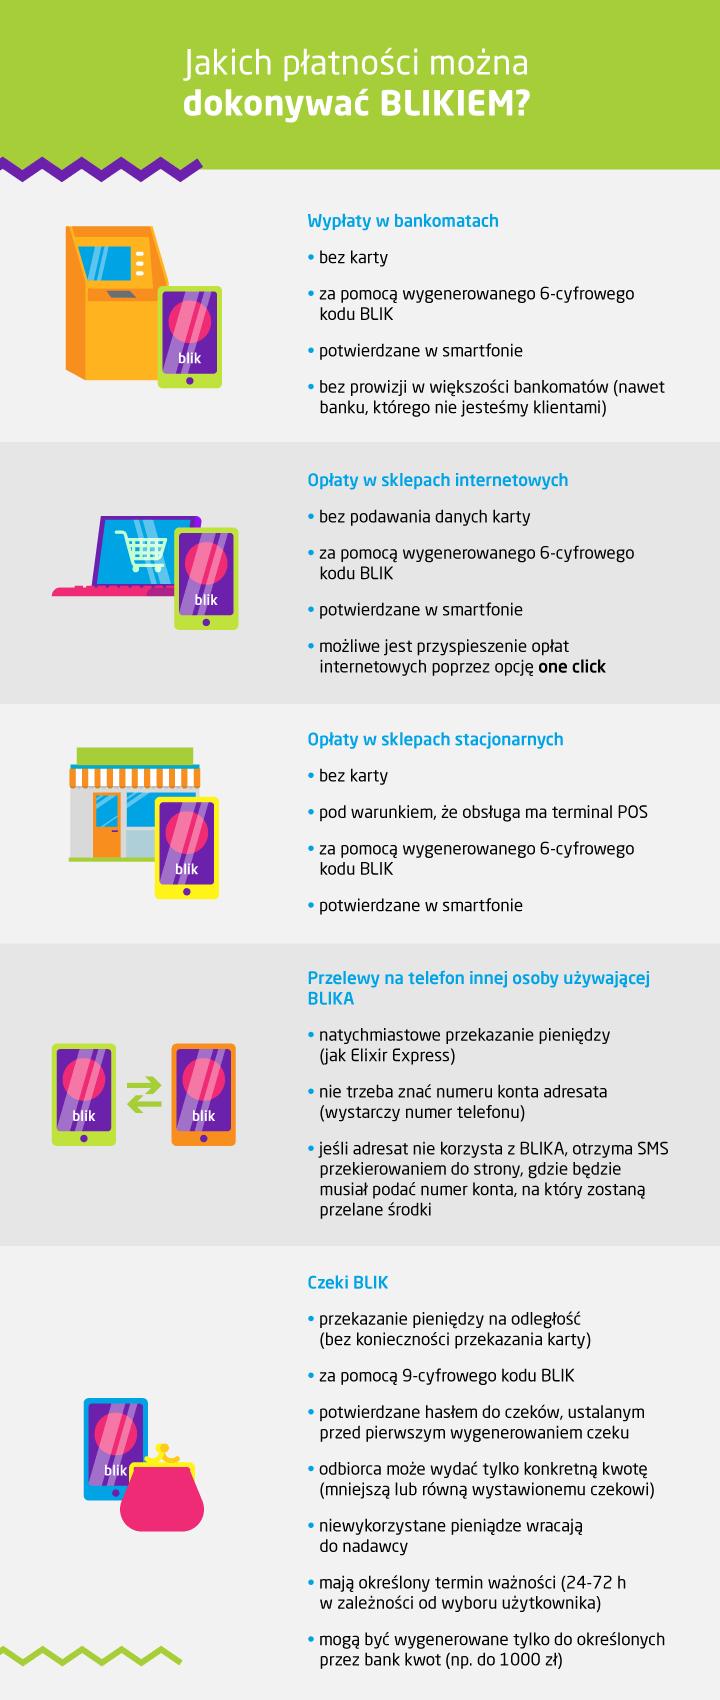 jak płacić blikiem infografika